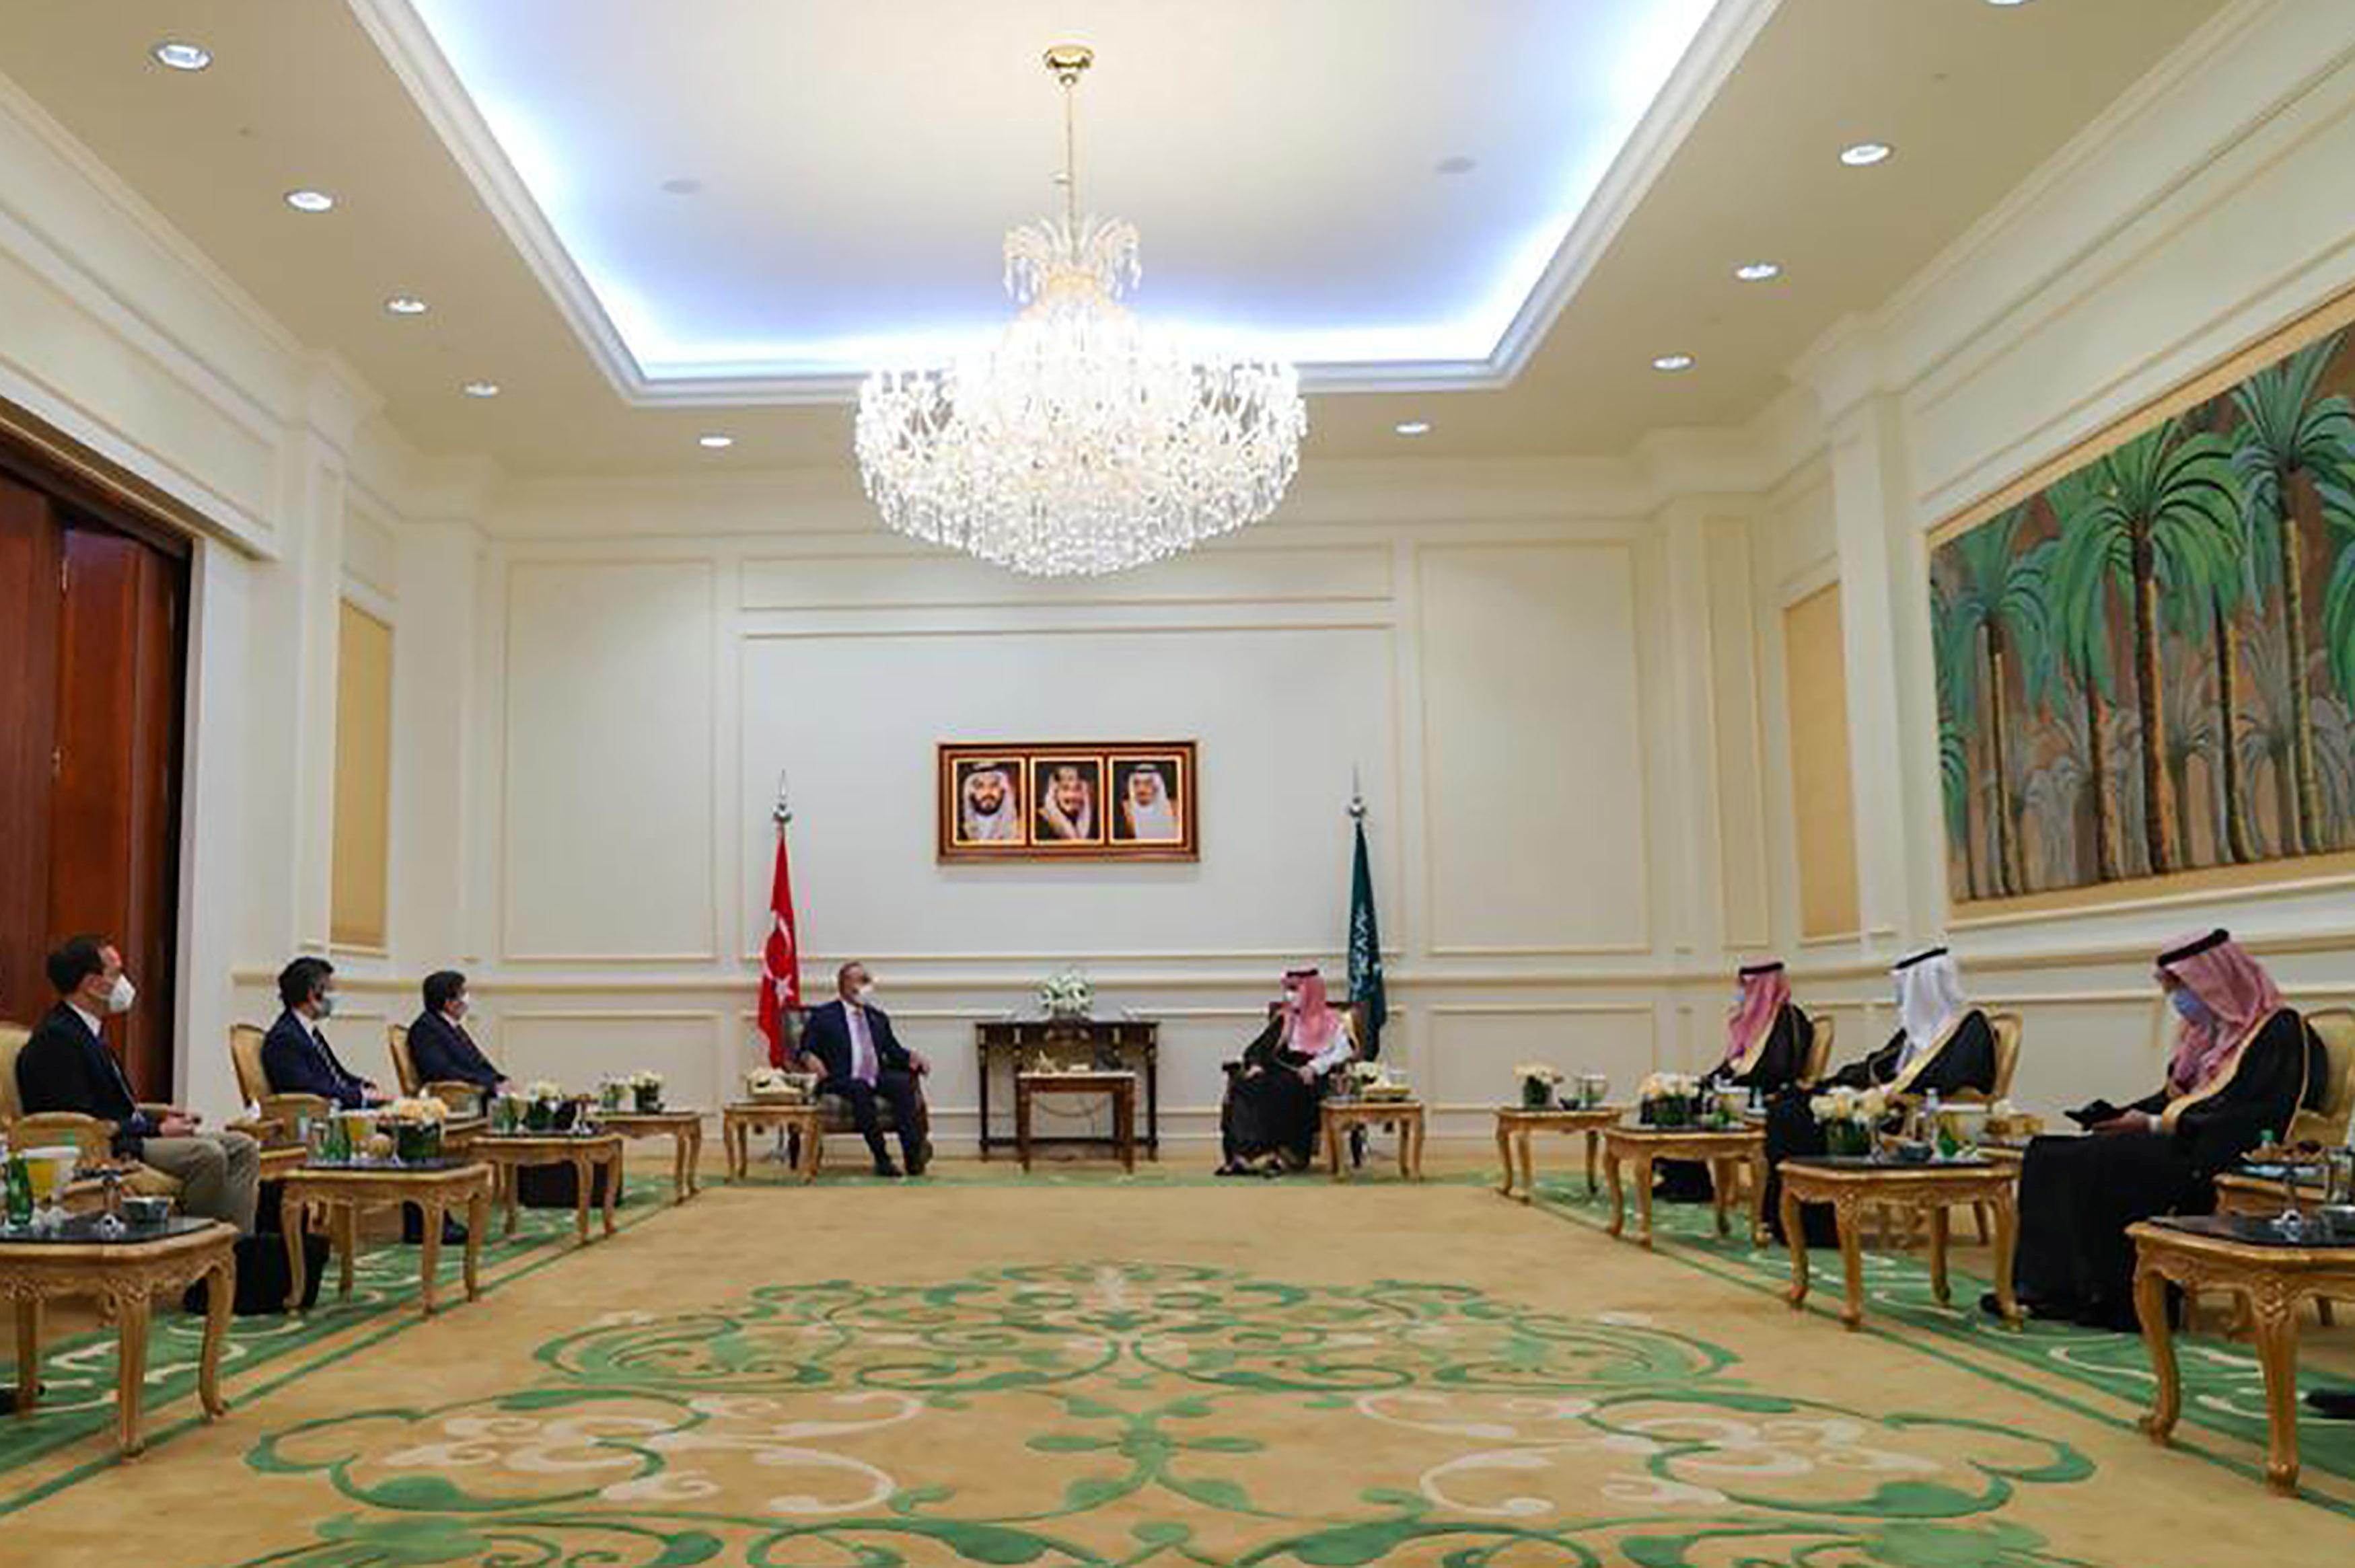 Turkish Foreign Minister, Mevlut Cavusoglu meets with Saudi Foreign Minister, Prince Faisal bin Farhan Al-Saud in the holy city of Mecca, Saudi Arabia, May 11, 2021. Saudi Press Agency/Handout via REUTERS